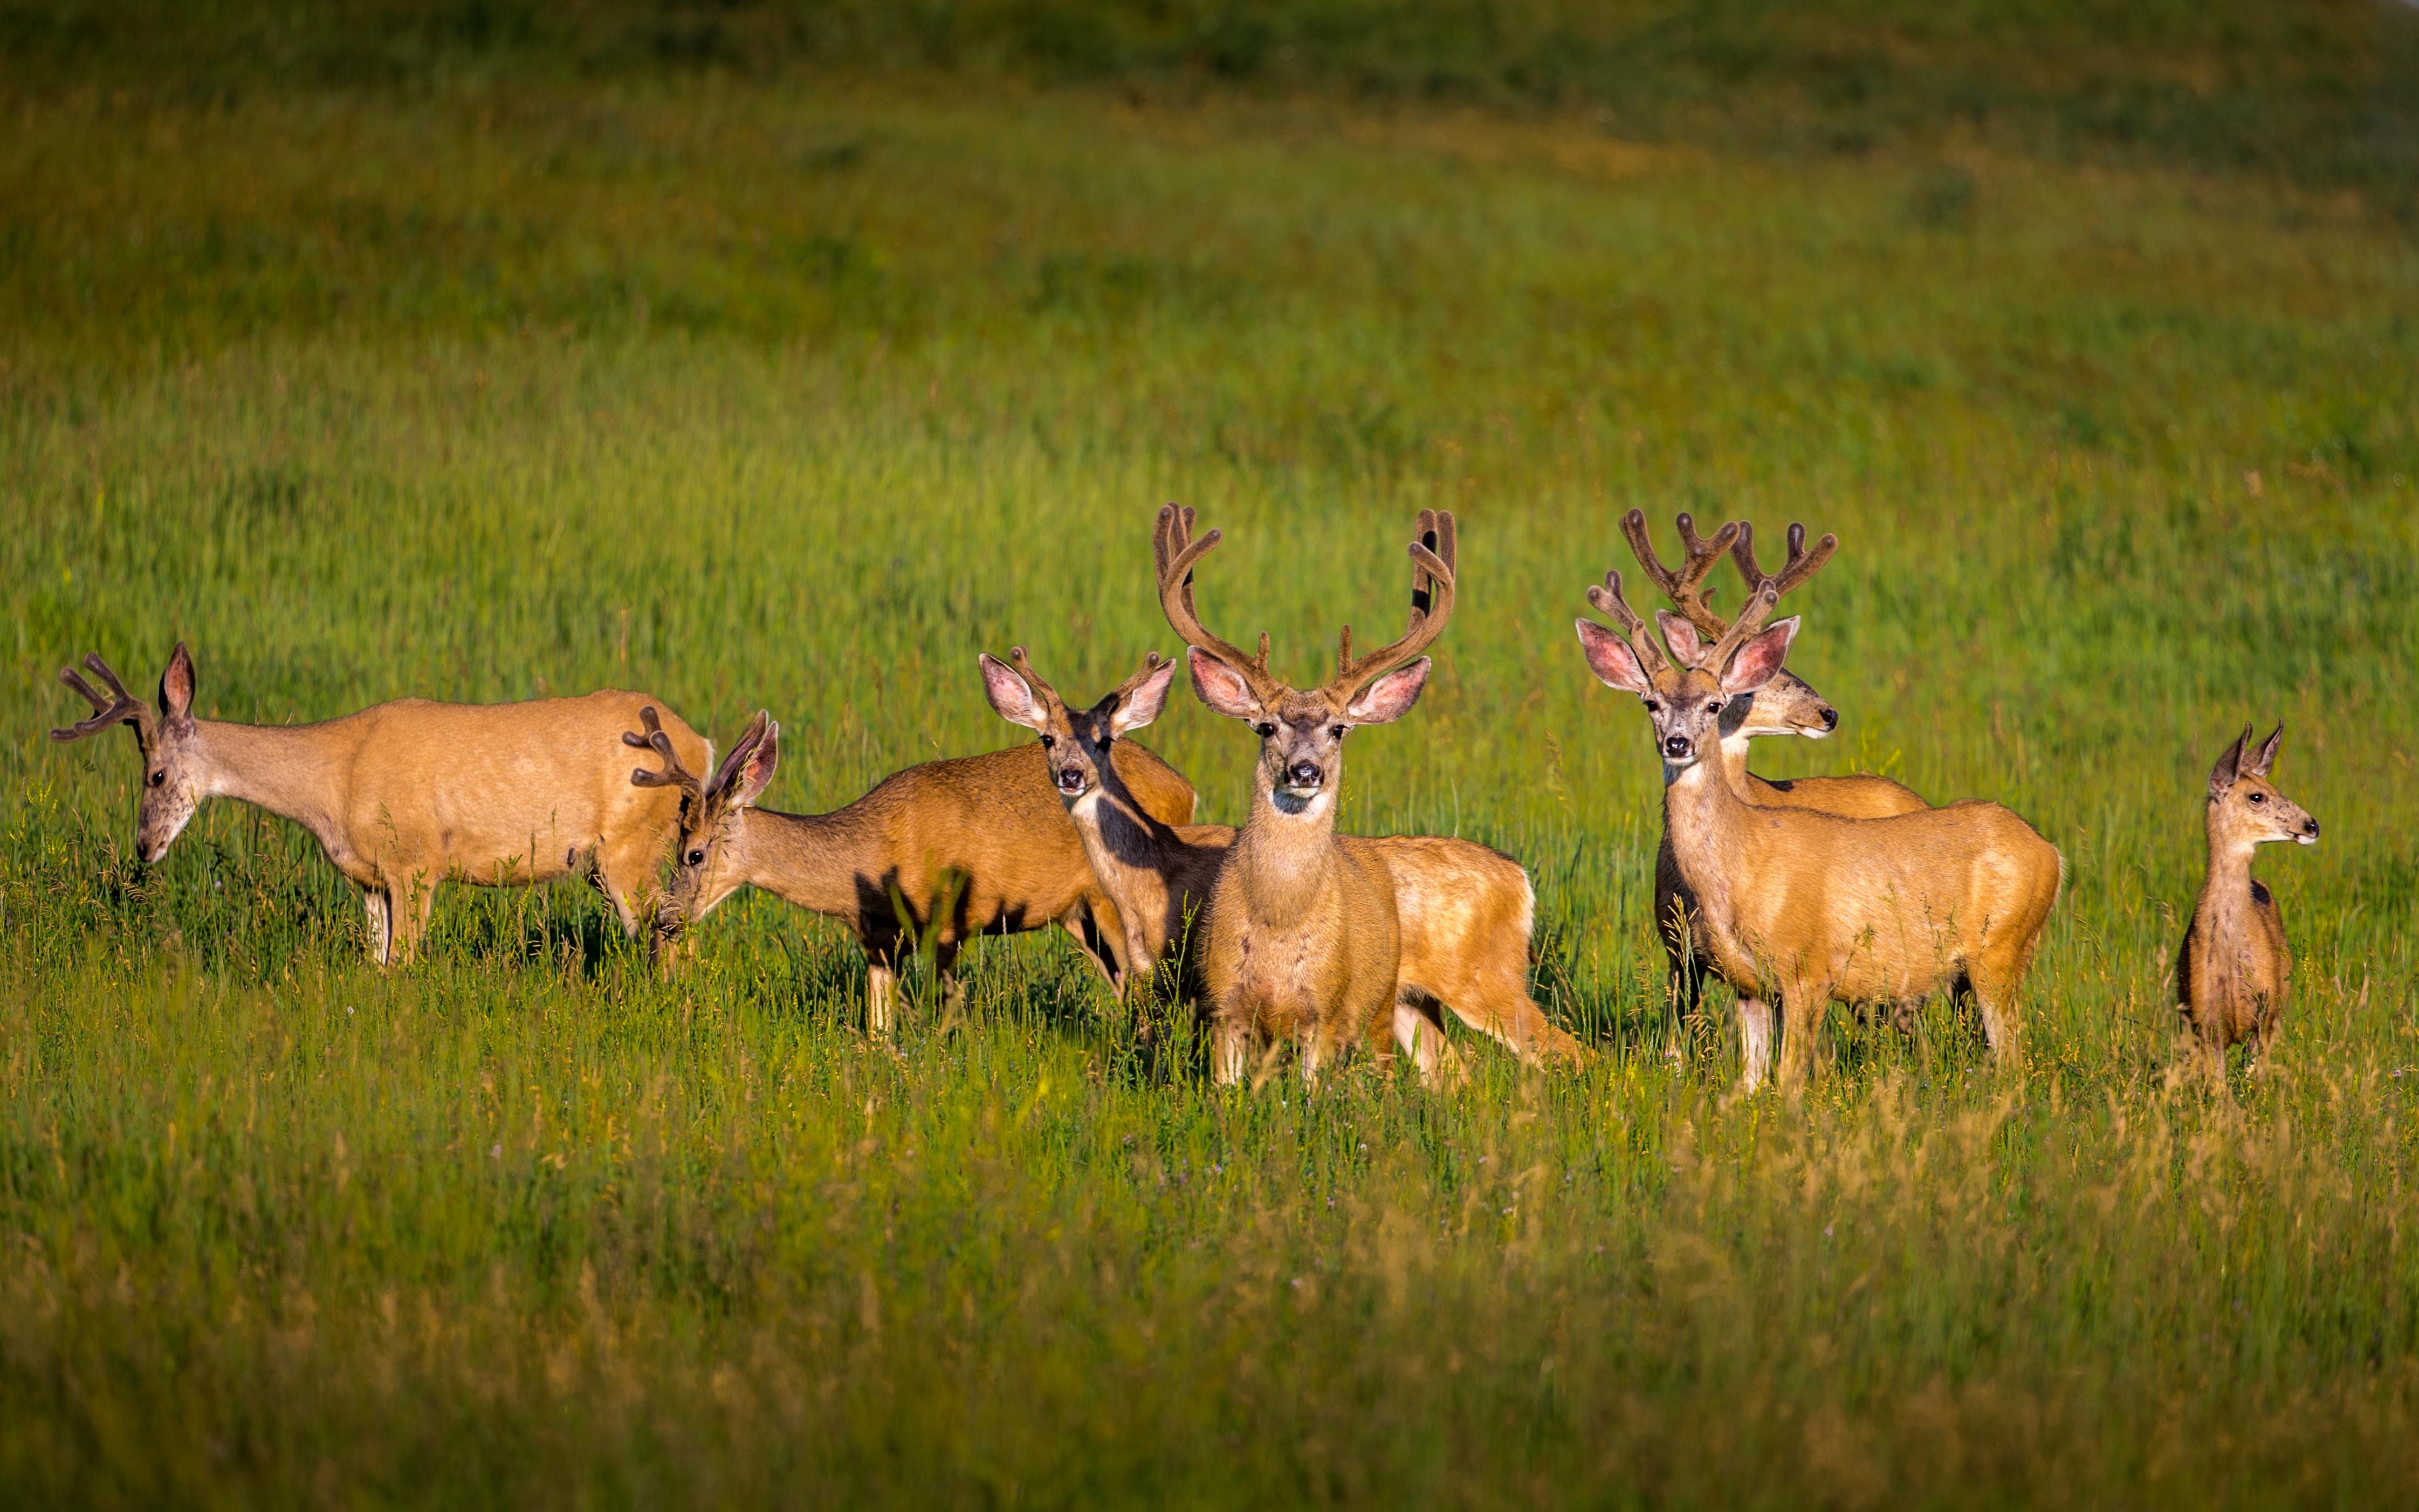 seven brown deer's standing on green grass filled ground